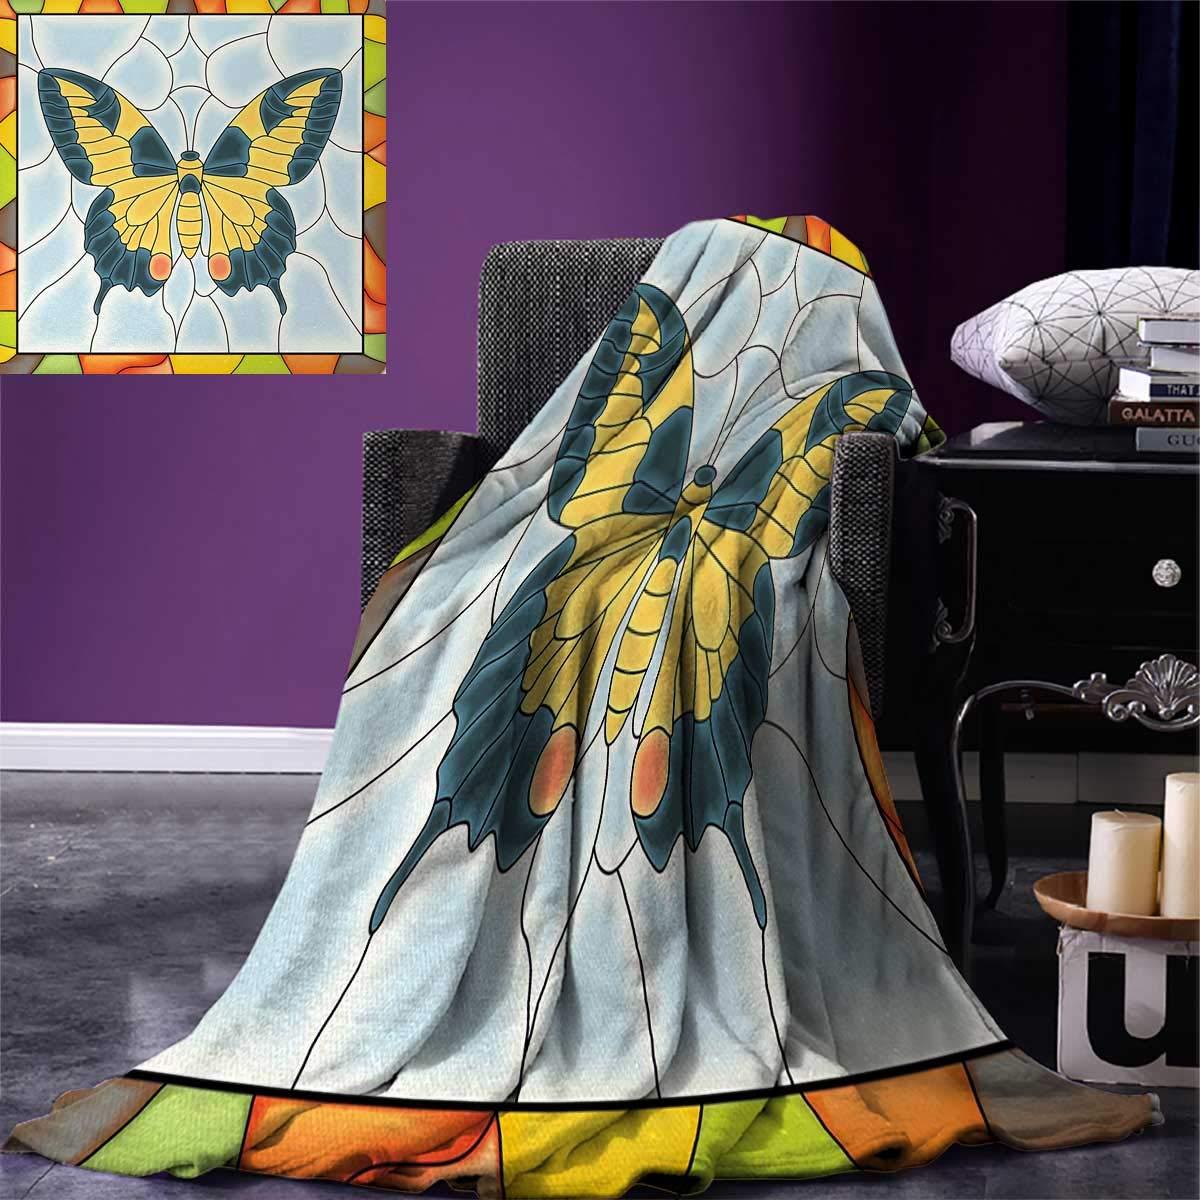 Anniutwo Butterflies Warm Microfiber All Season Blanket Butterfly in Stained-Glass Window Frame Wing Spring Garden Illustration Print Image Blanket 62''x60'' Multicolor